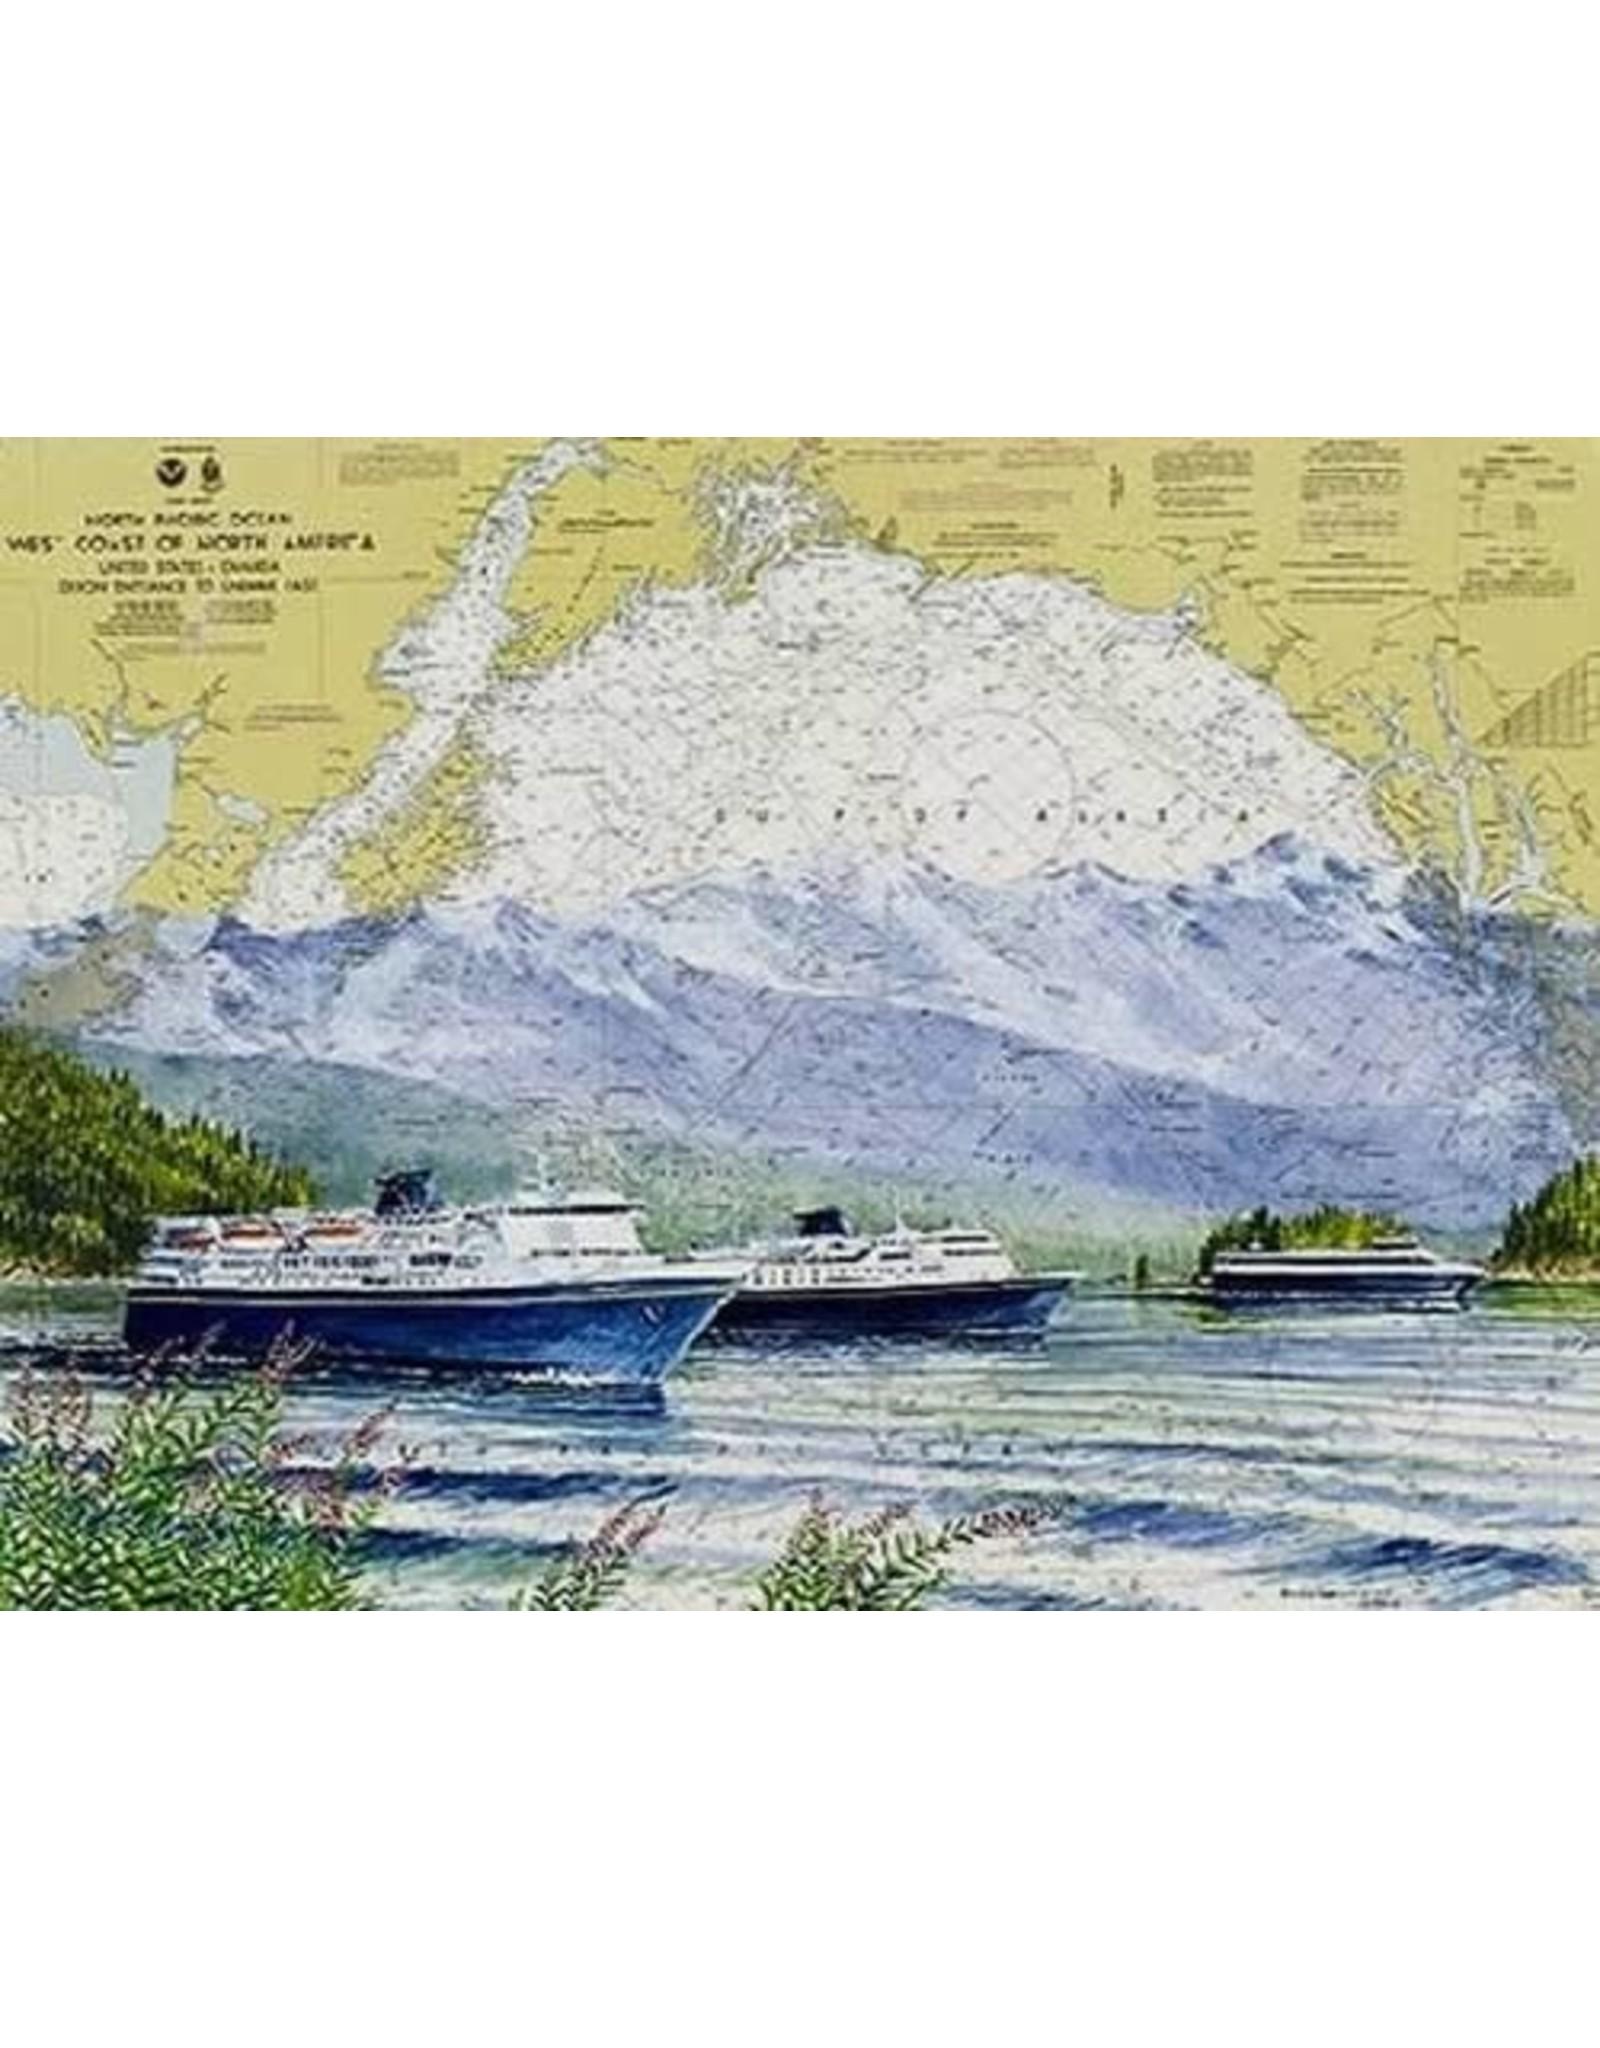 Brenda Schwartz Alaska Marine Highway | Brenda Schwartz